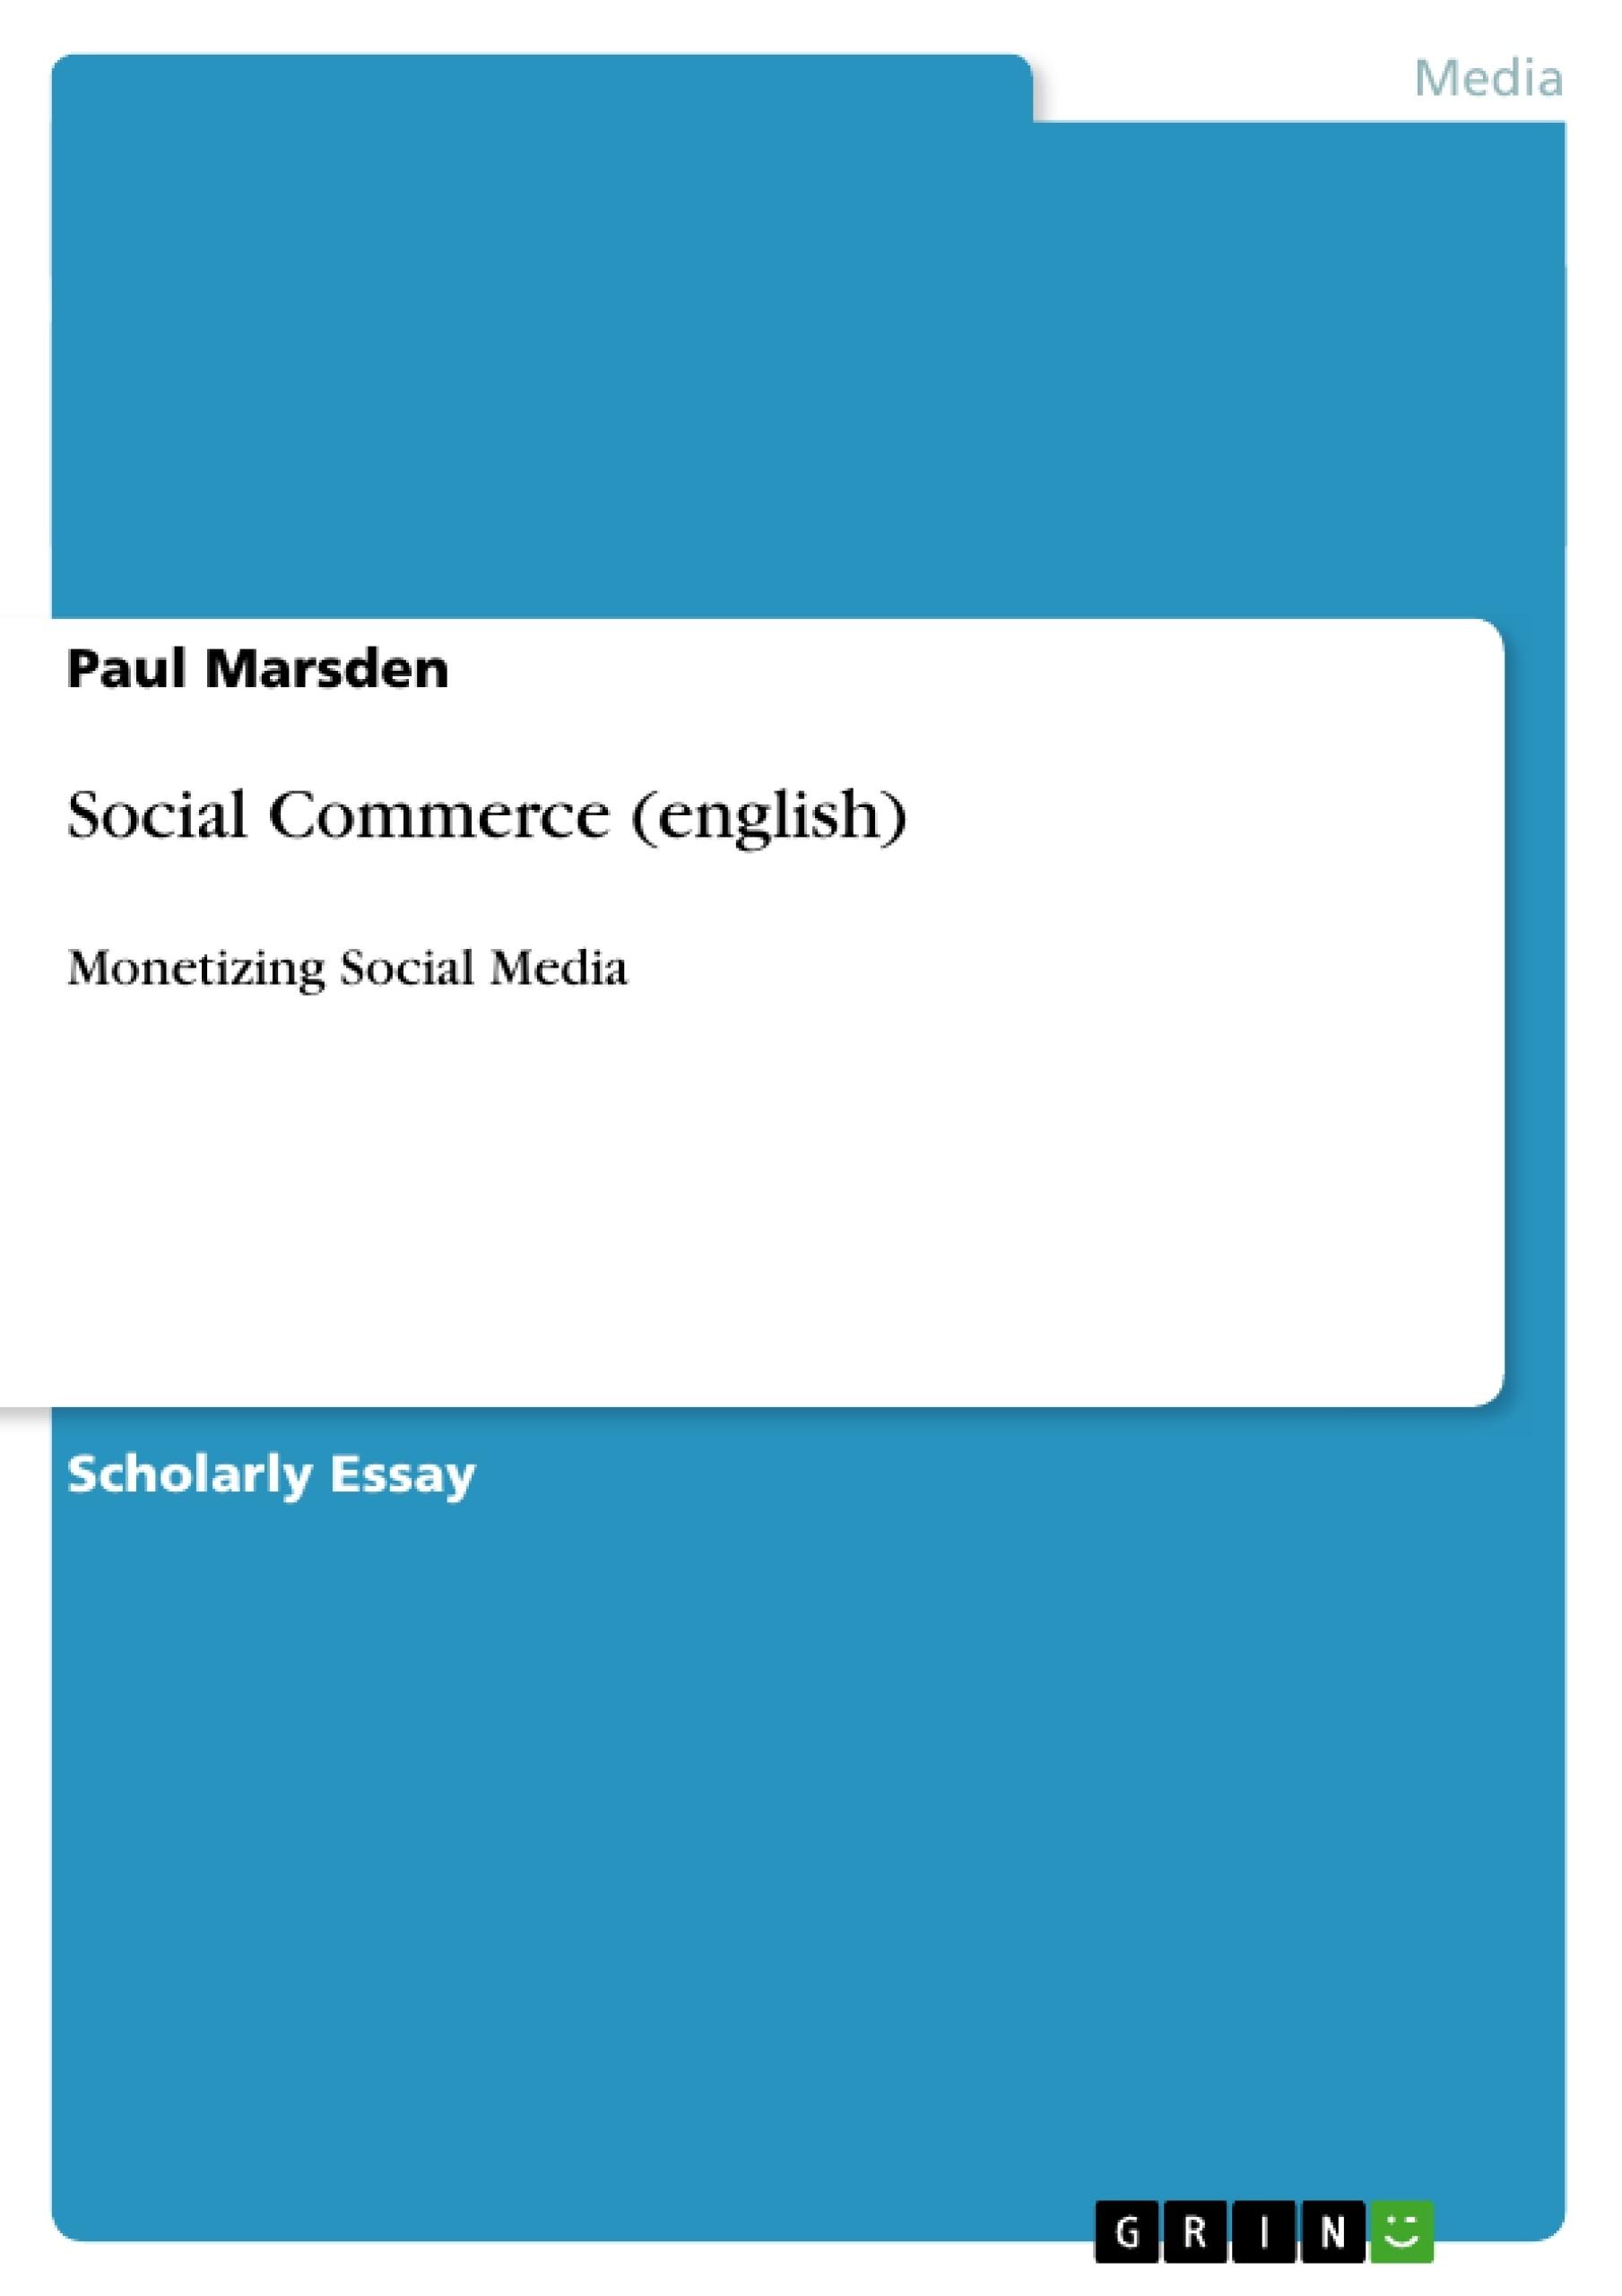 Title: Social Commerce (english)